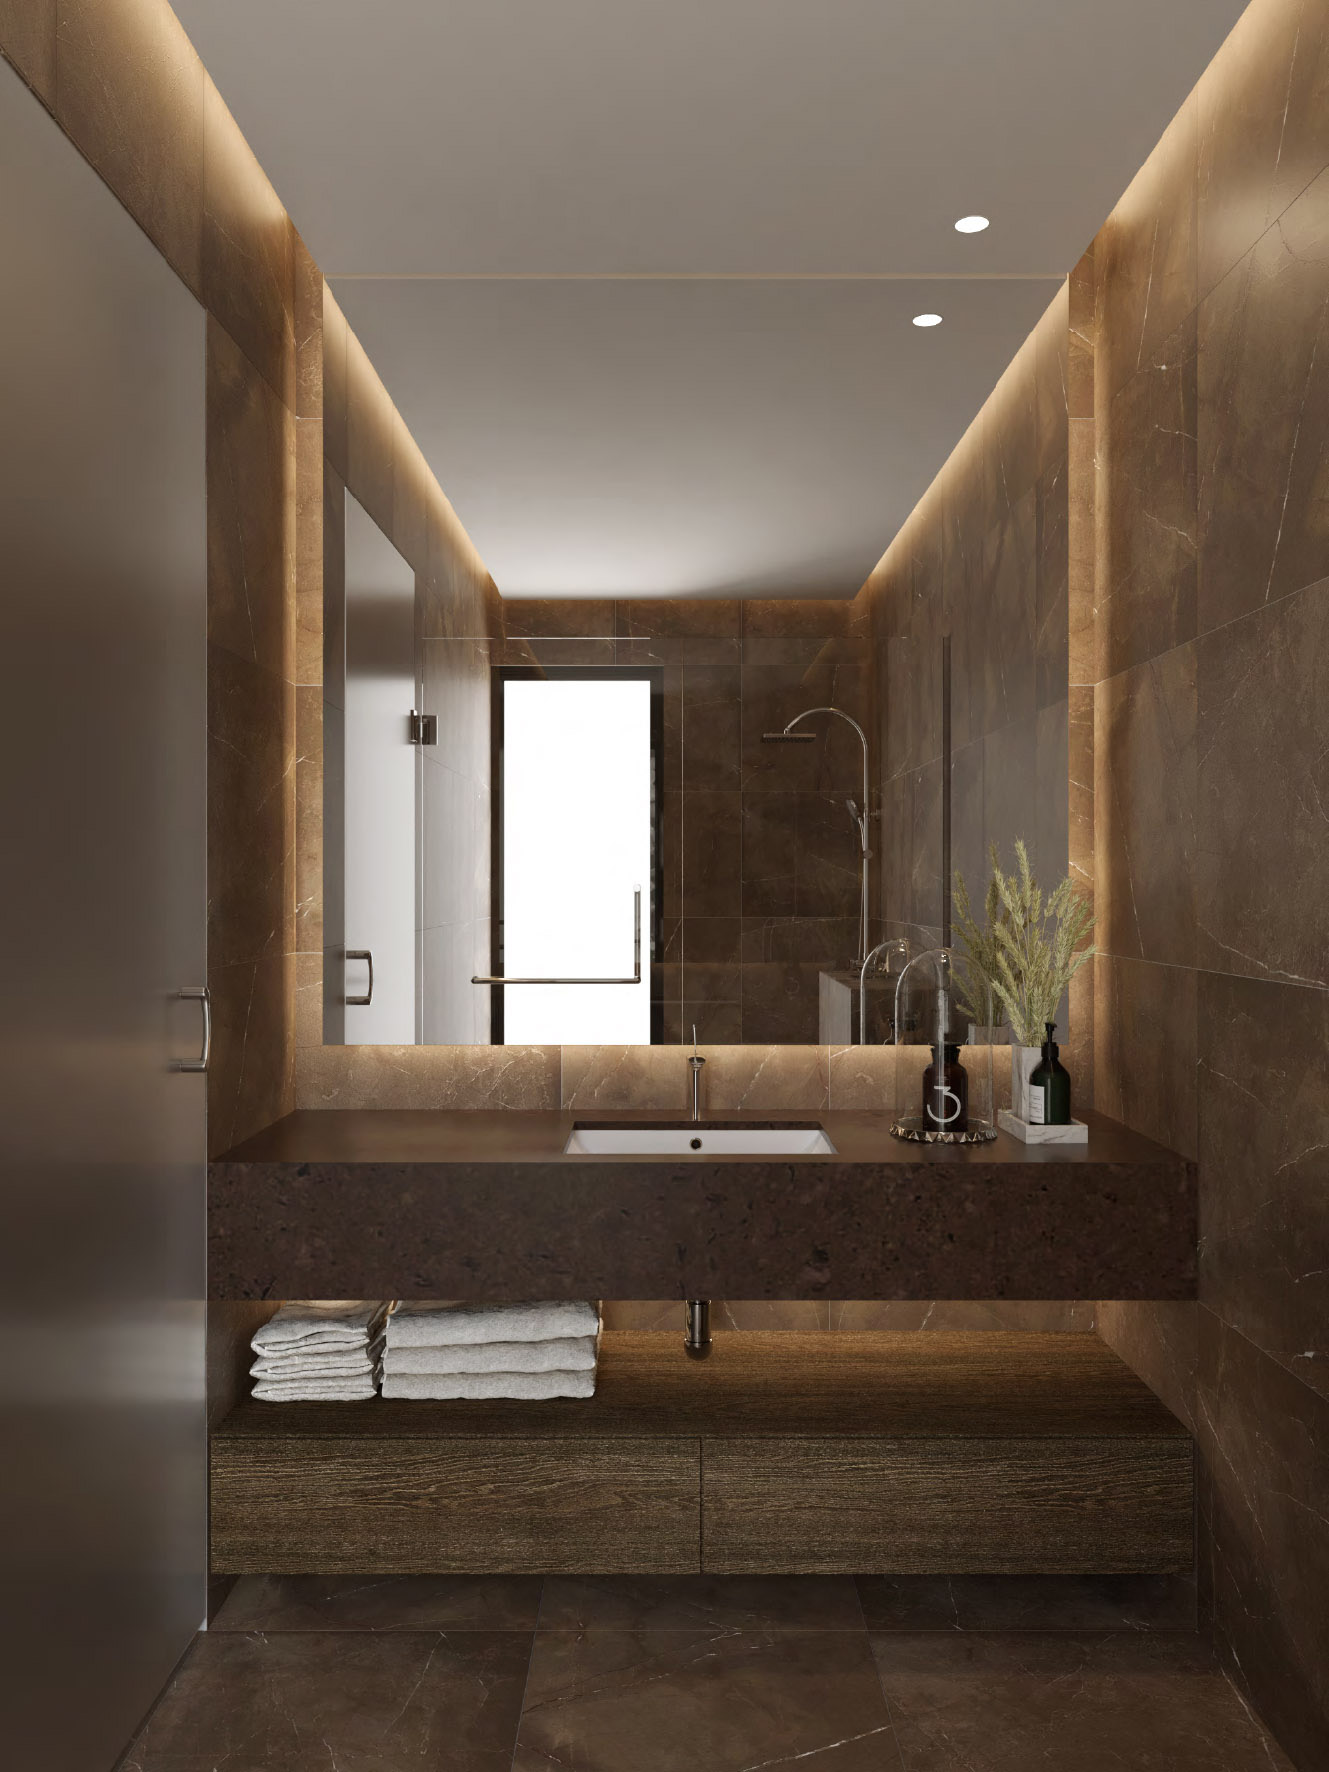 LV309 Bath 4